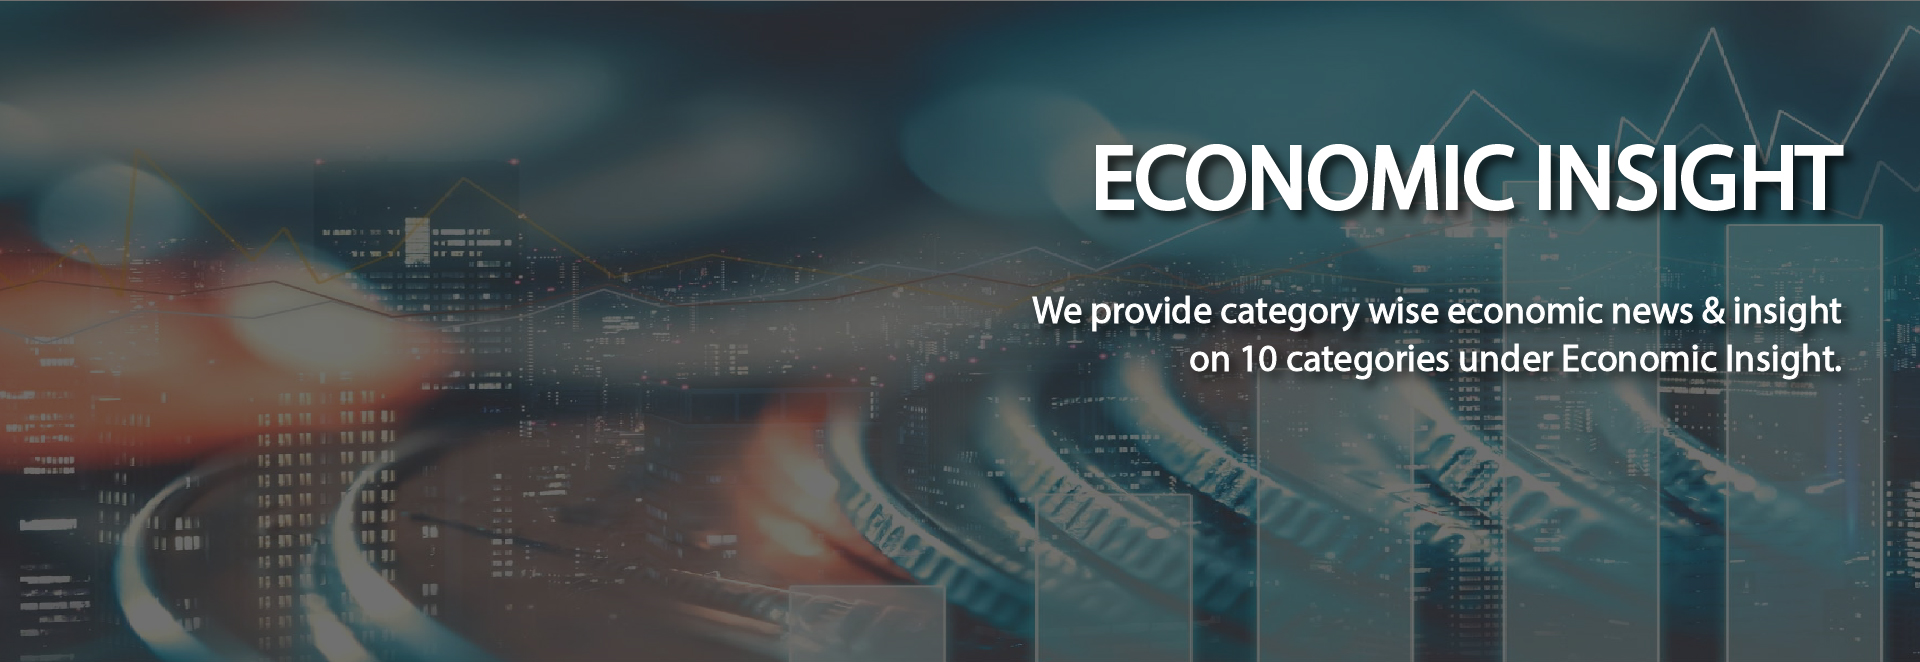 Economic Insight-01-01